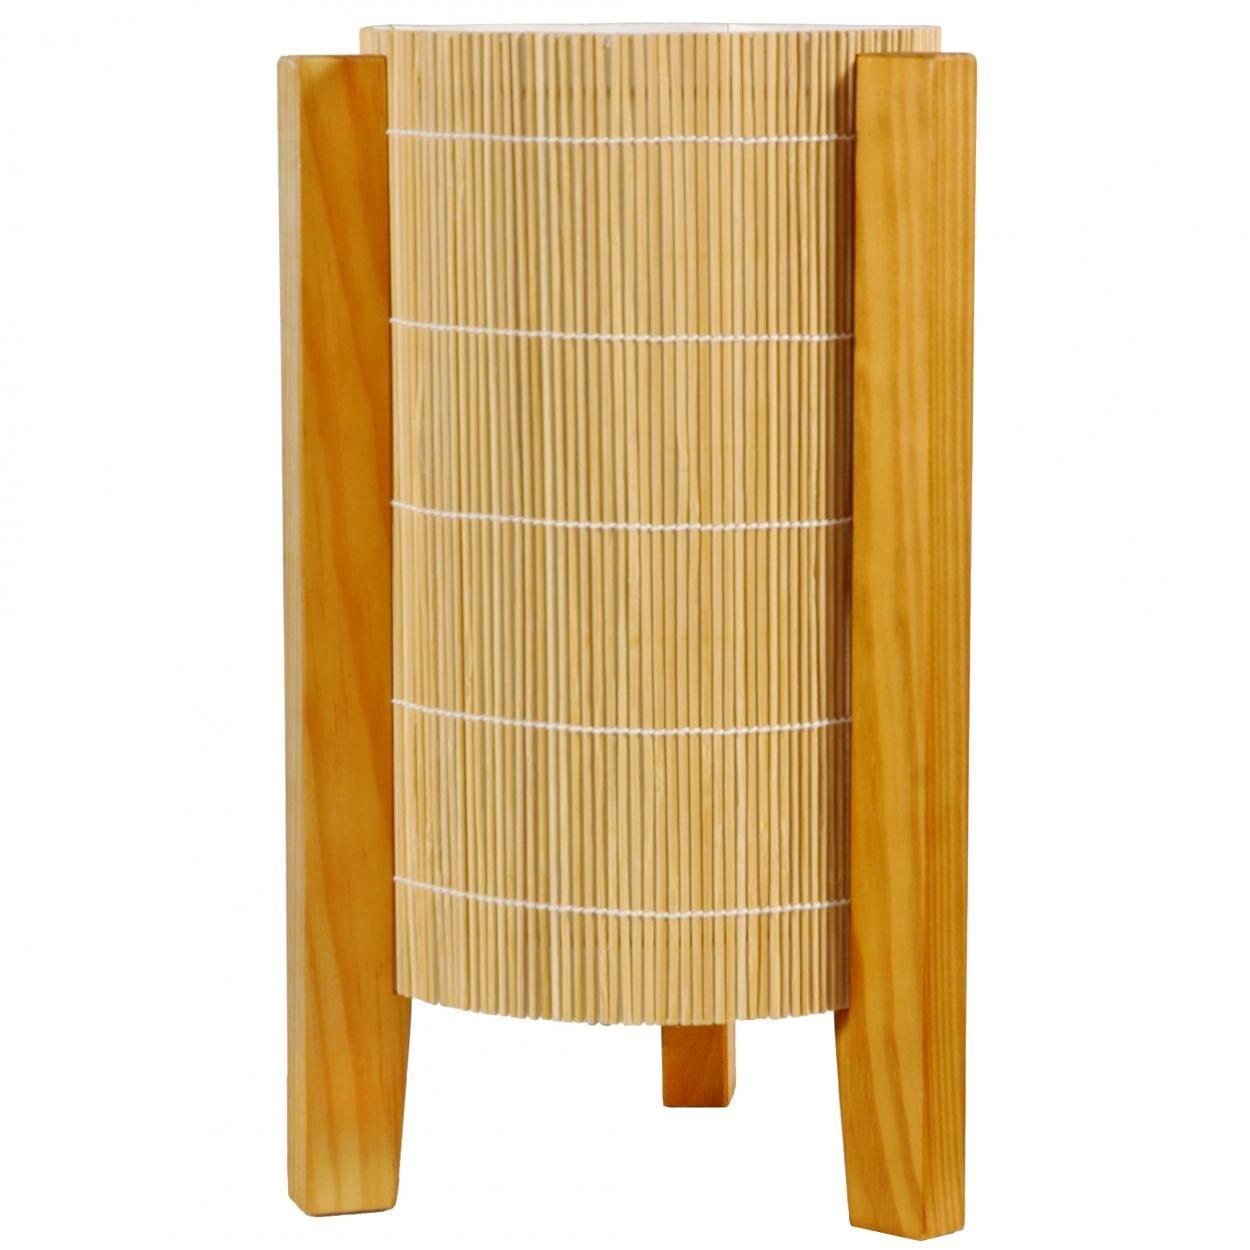 Buy 13 Kago Lamp Online Lmpkago Satisfaction Guaranteed Oriental